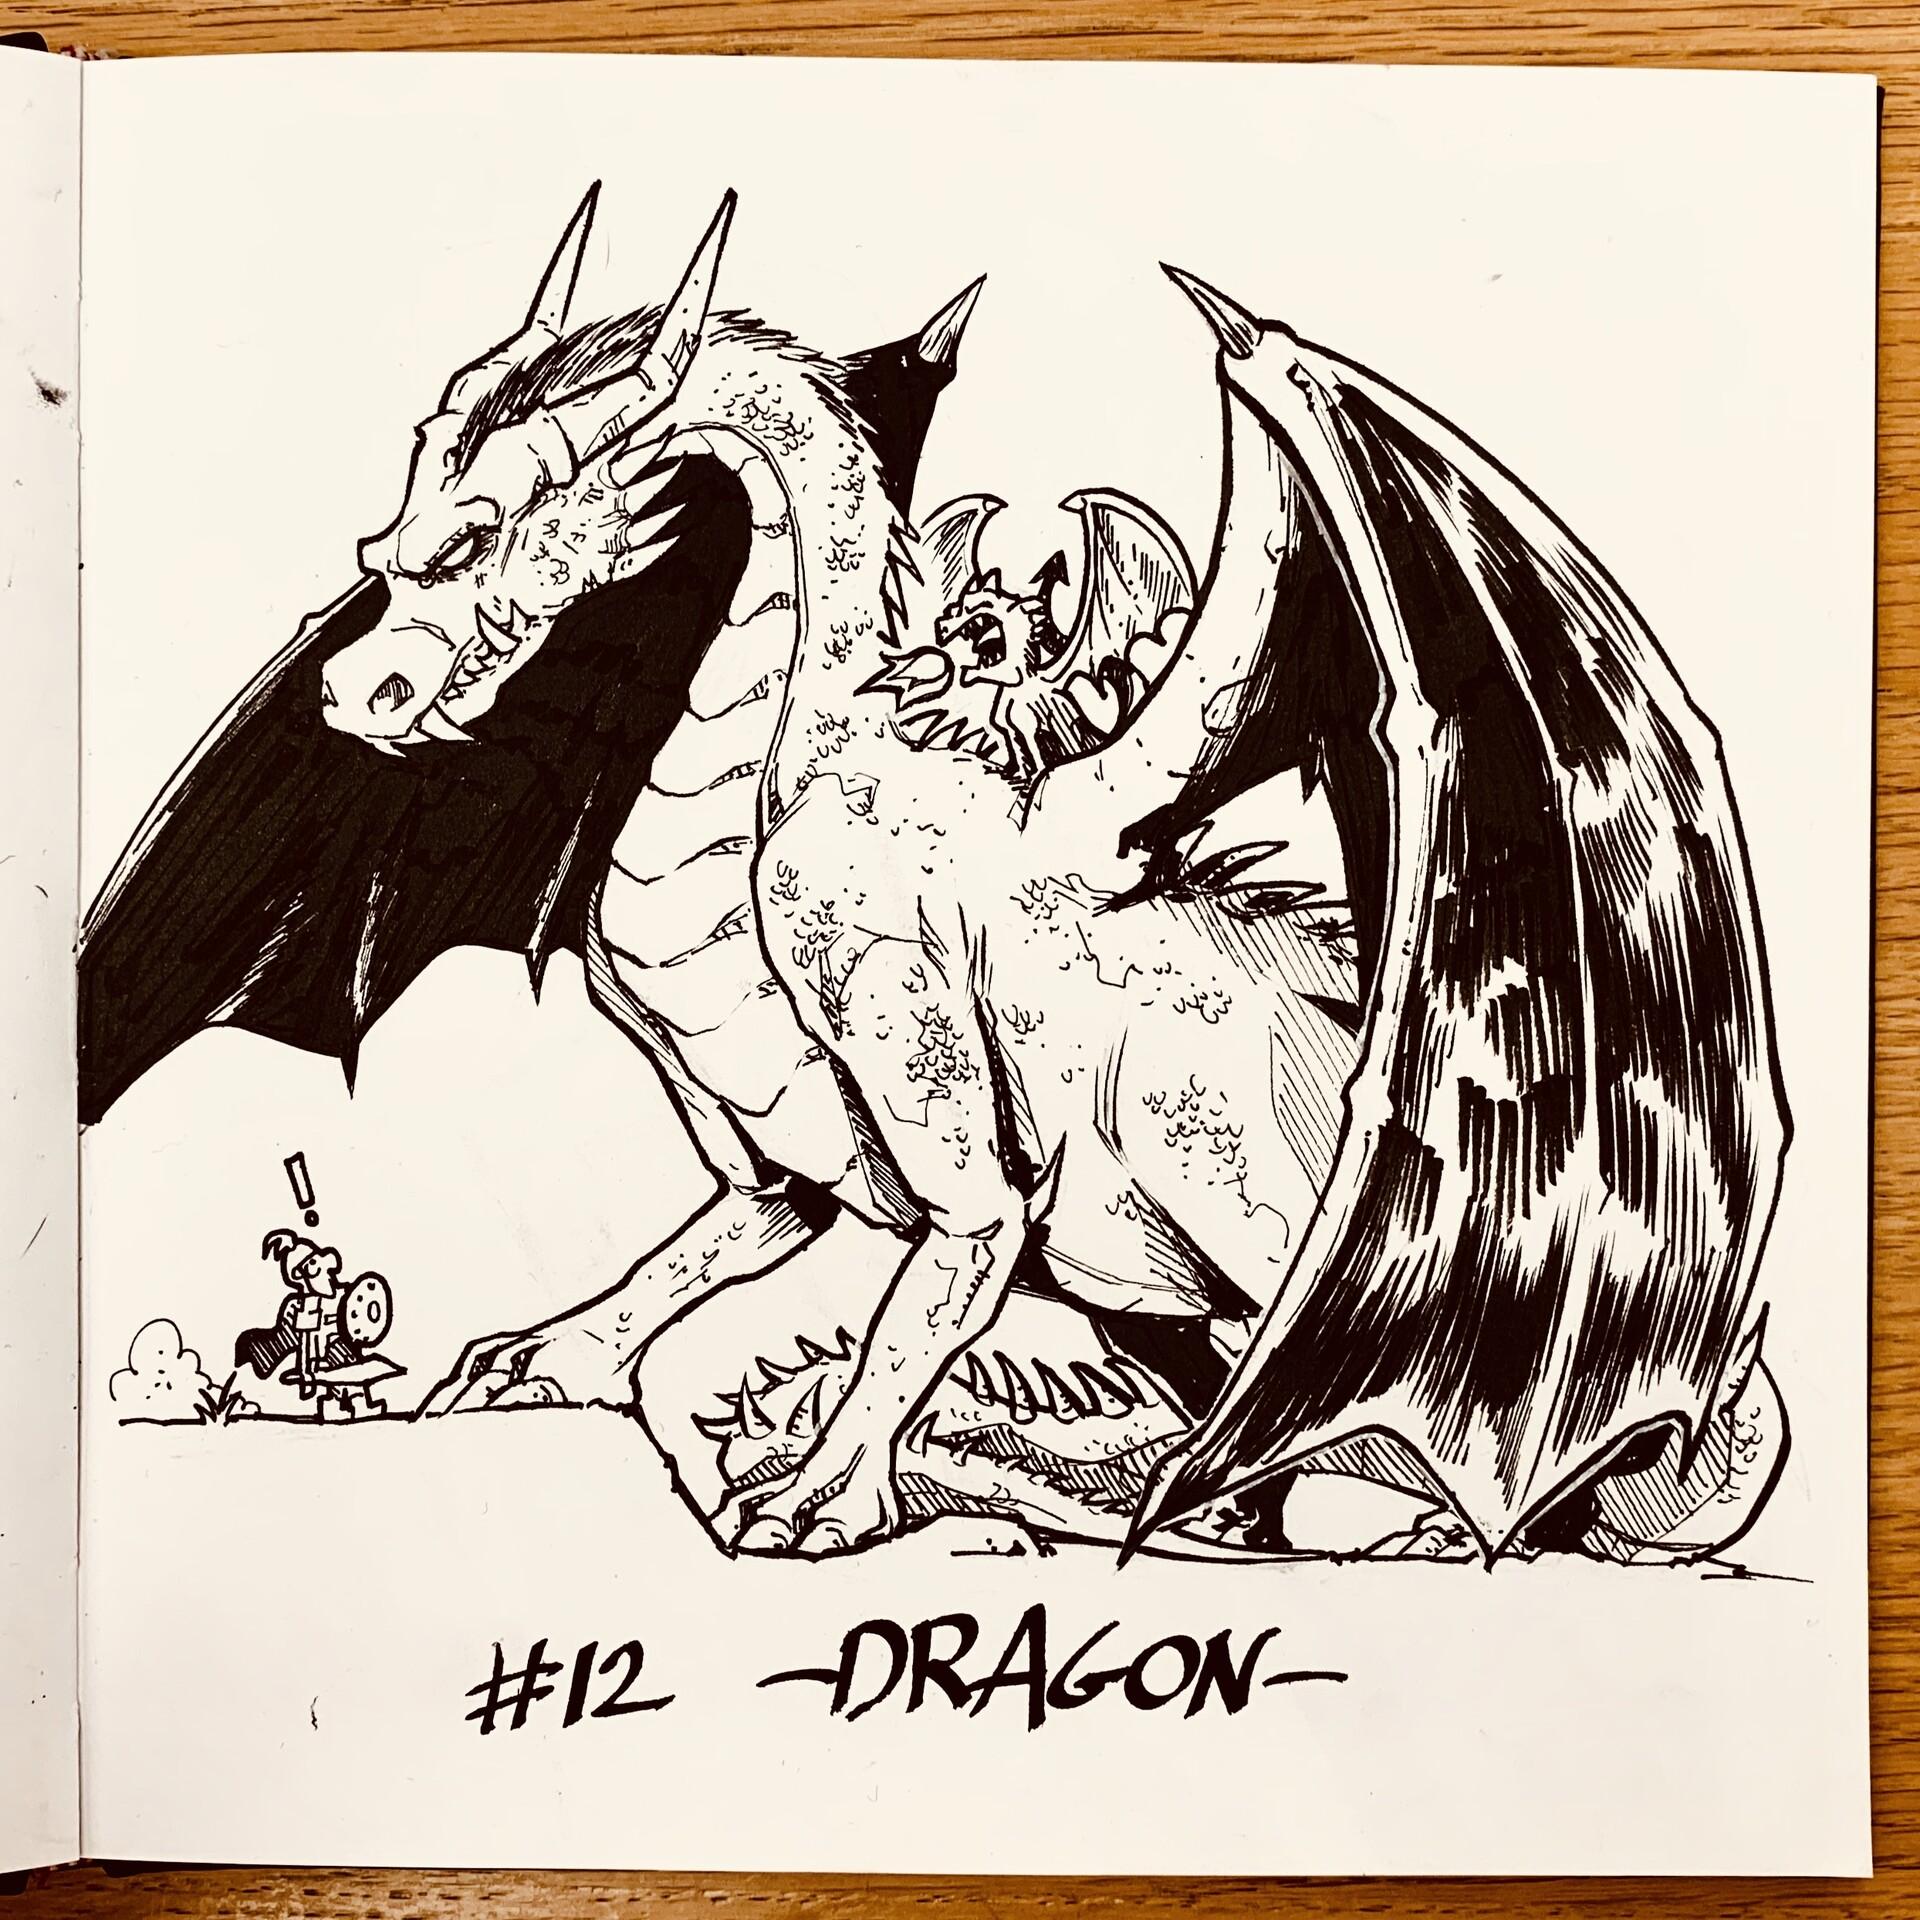 Inktober 2019: #12. Dragon